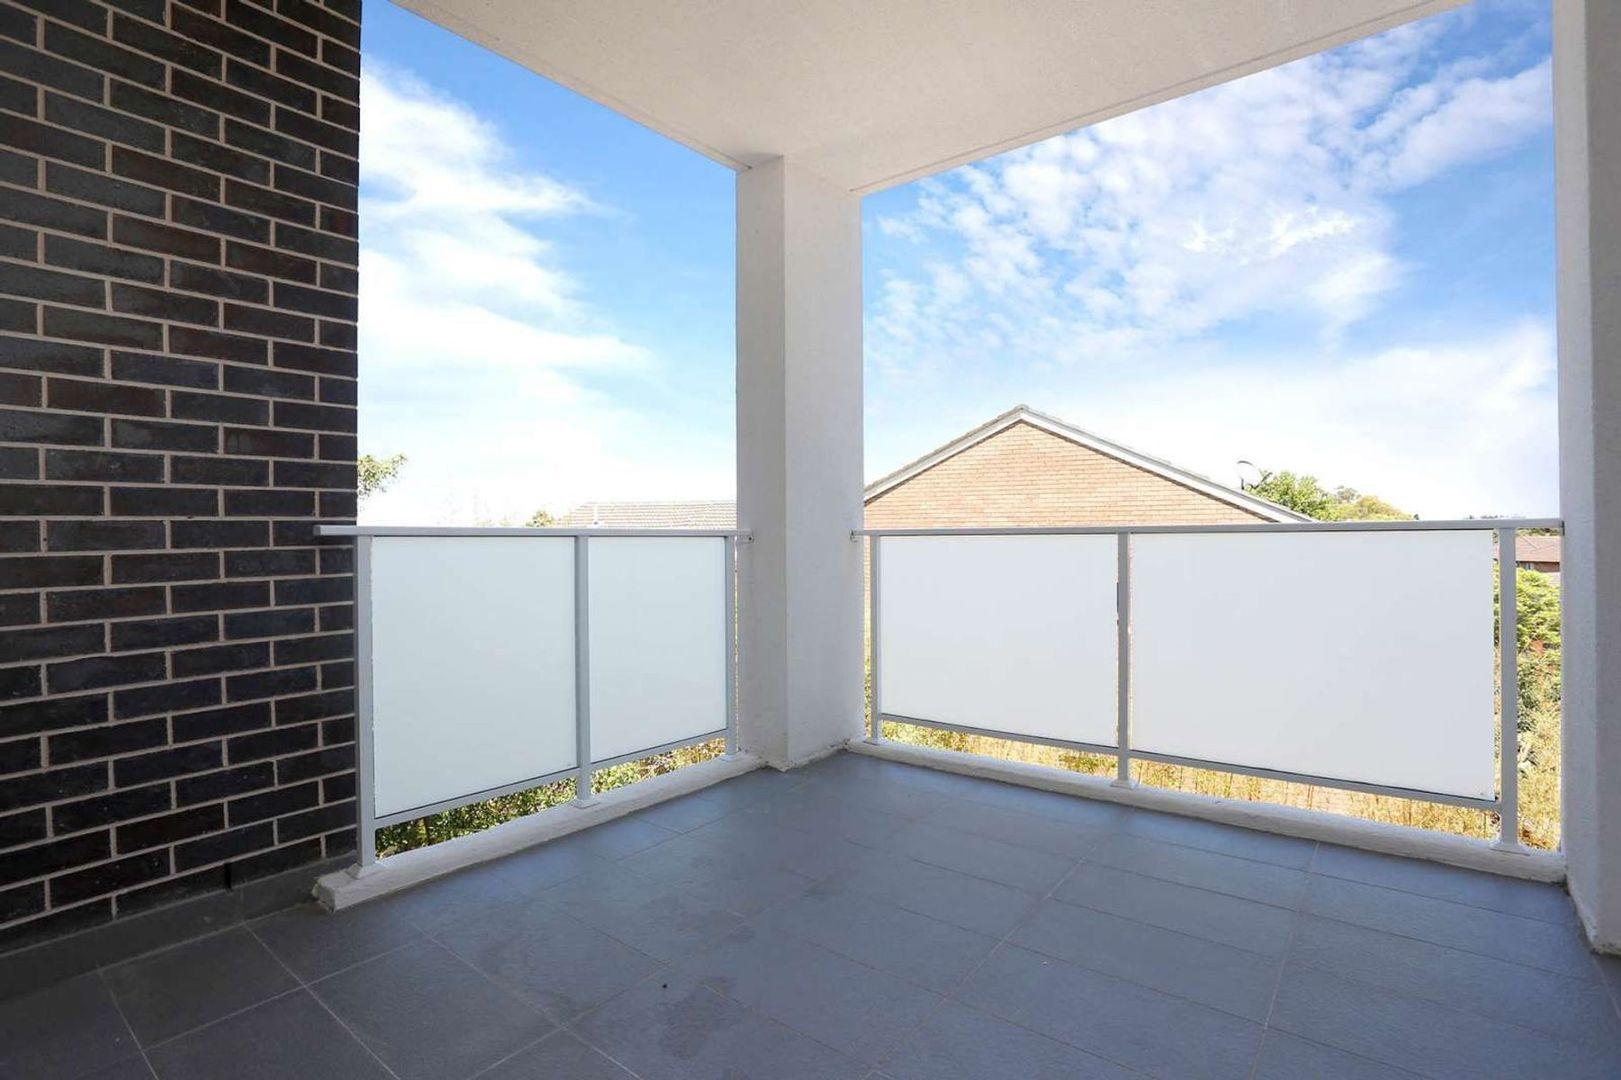 16/00 Pearson Street, Gladesville NSW 2111, Image 1